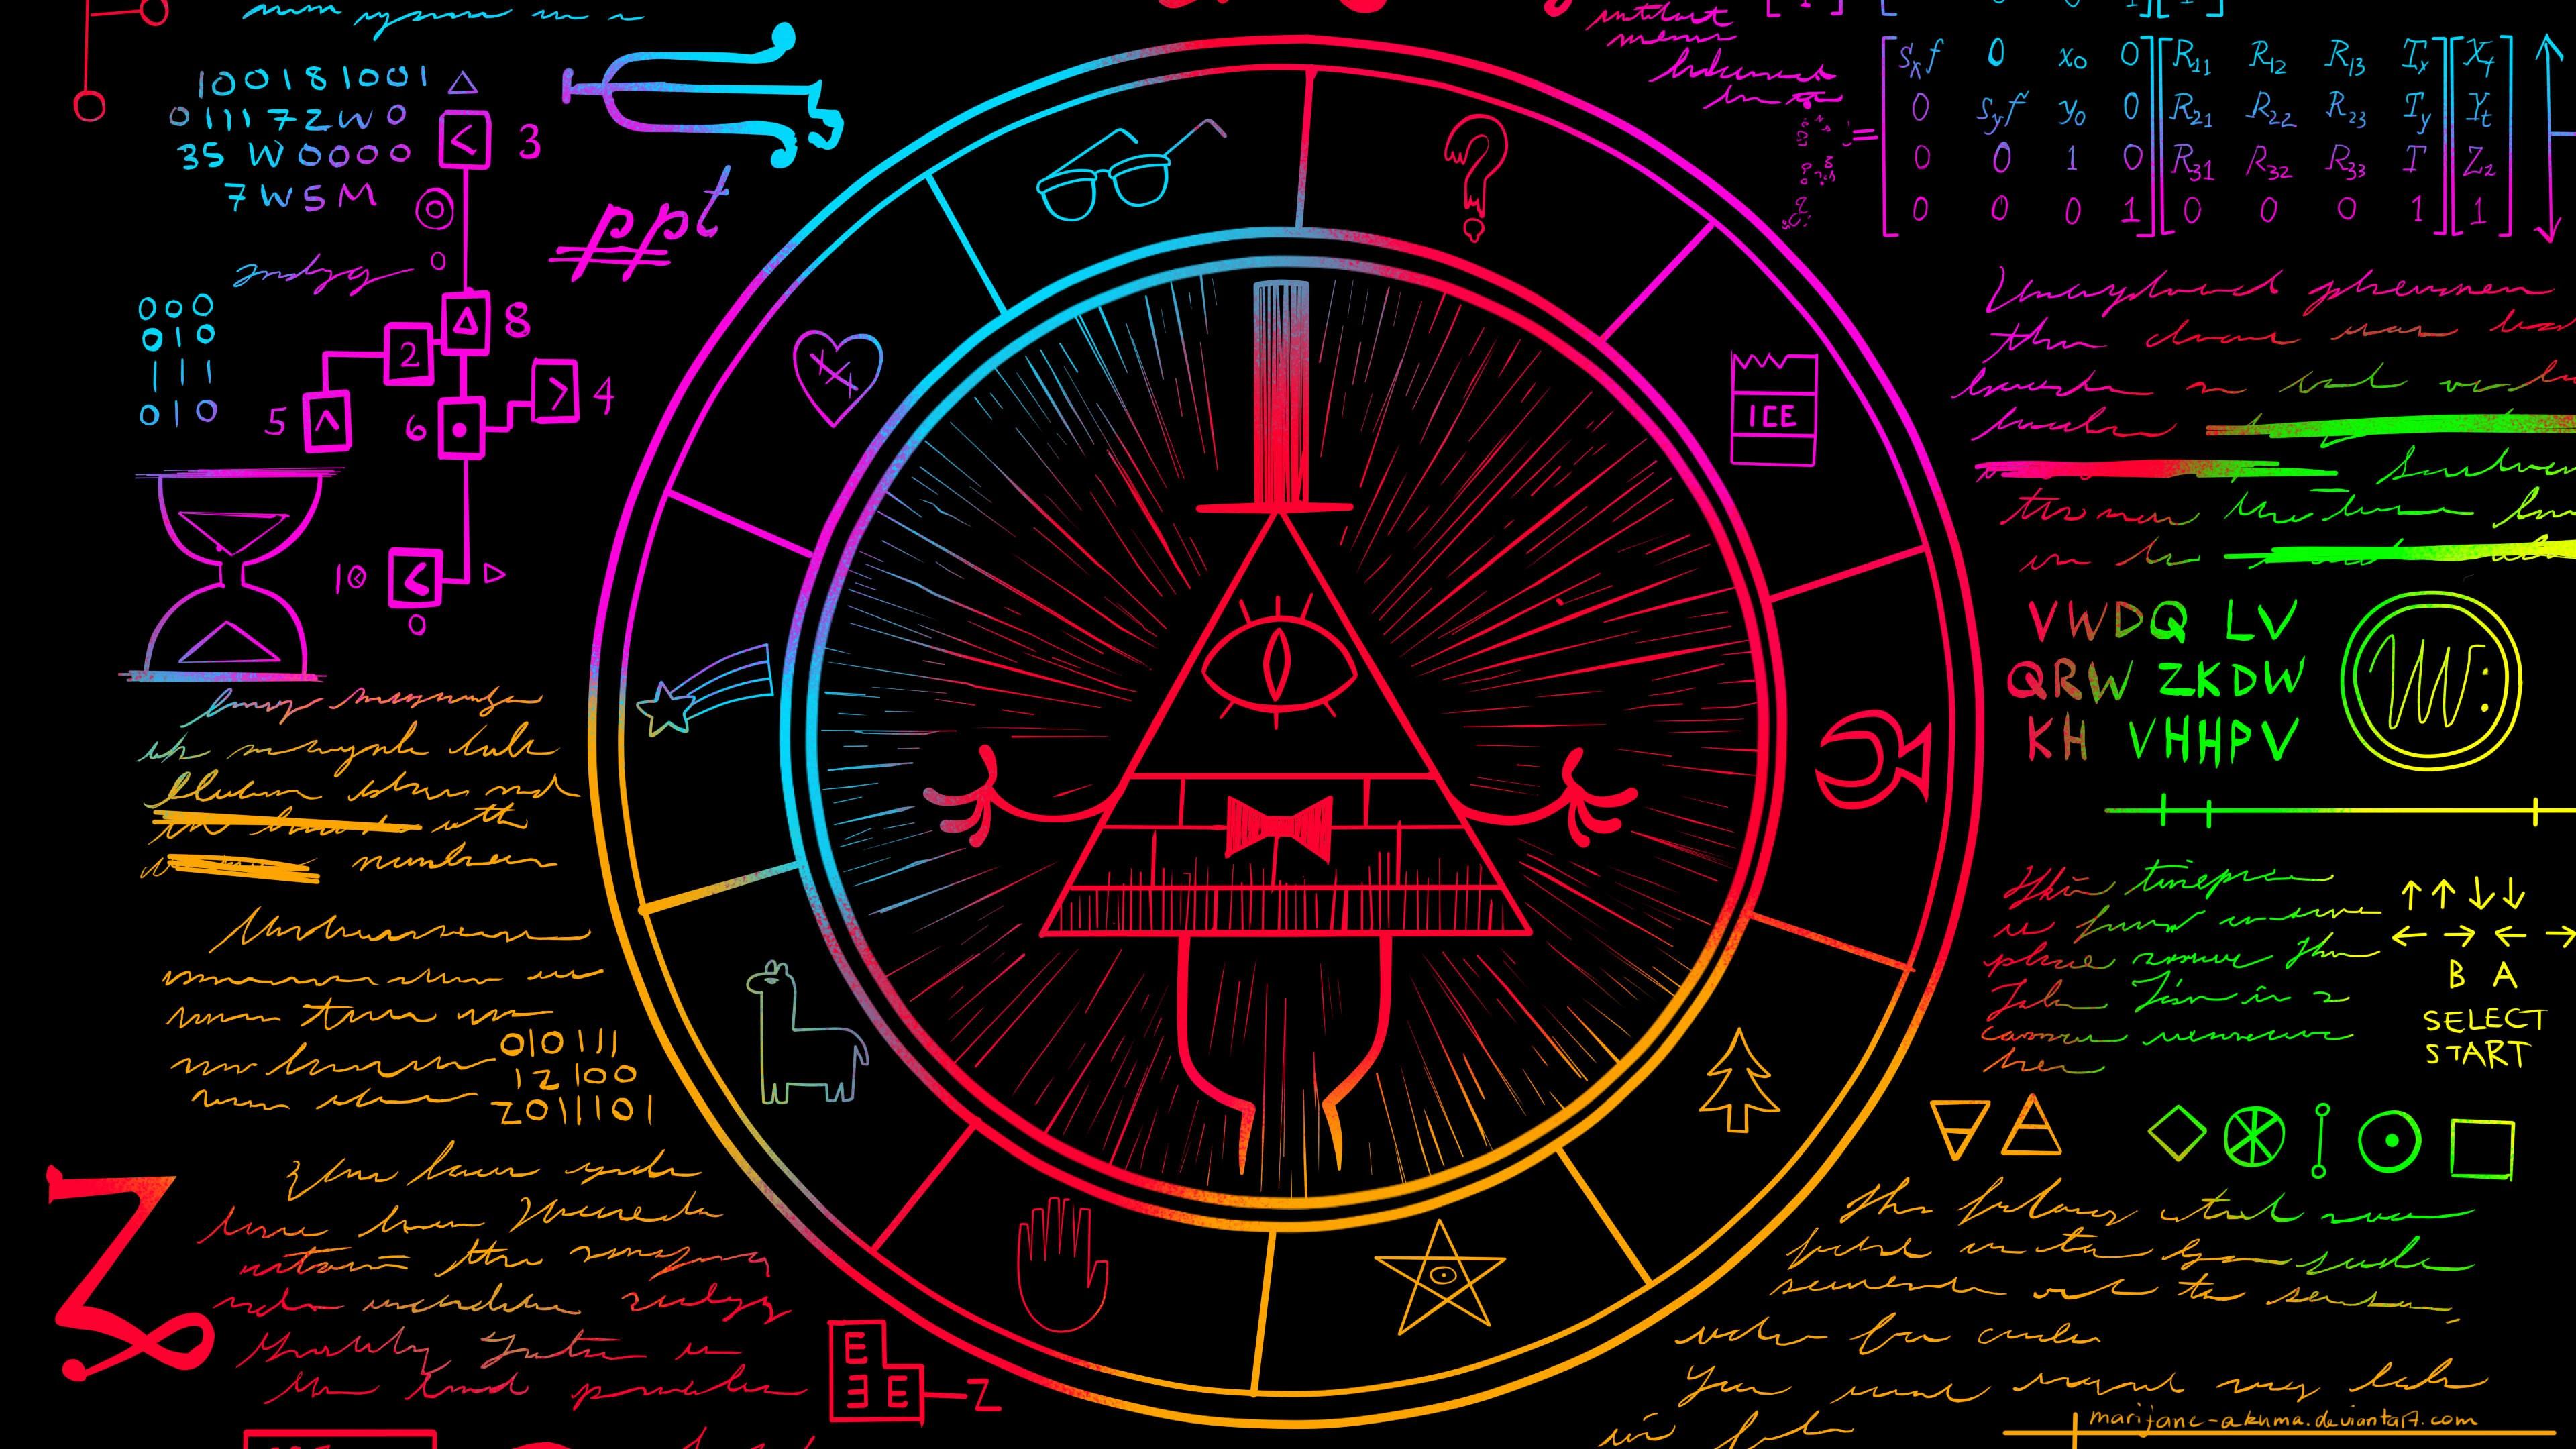 Awesome Hd Wallpaper Illuminati